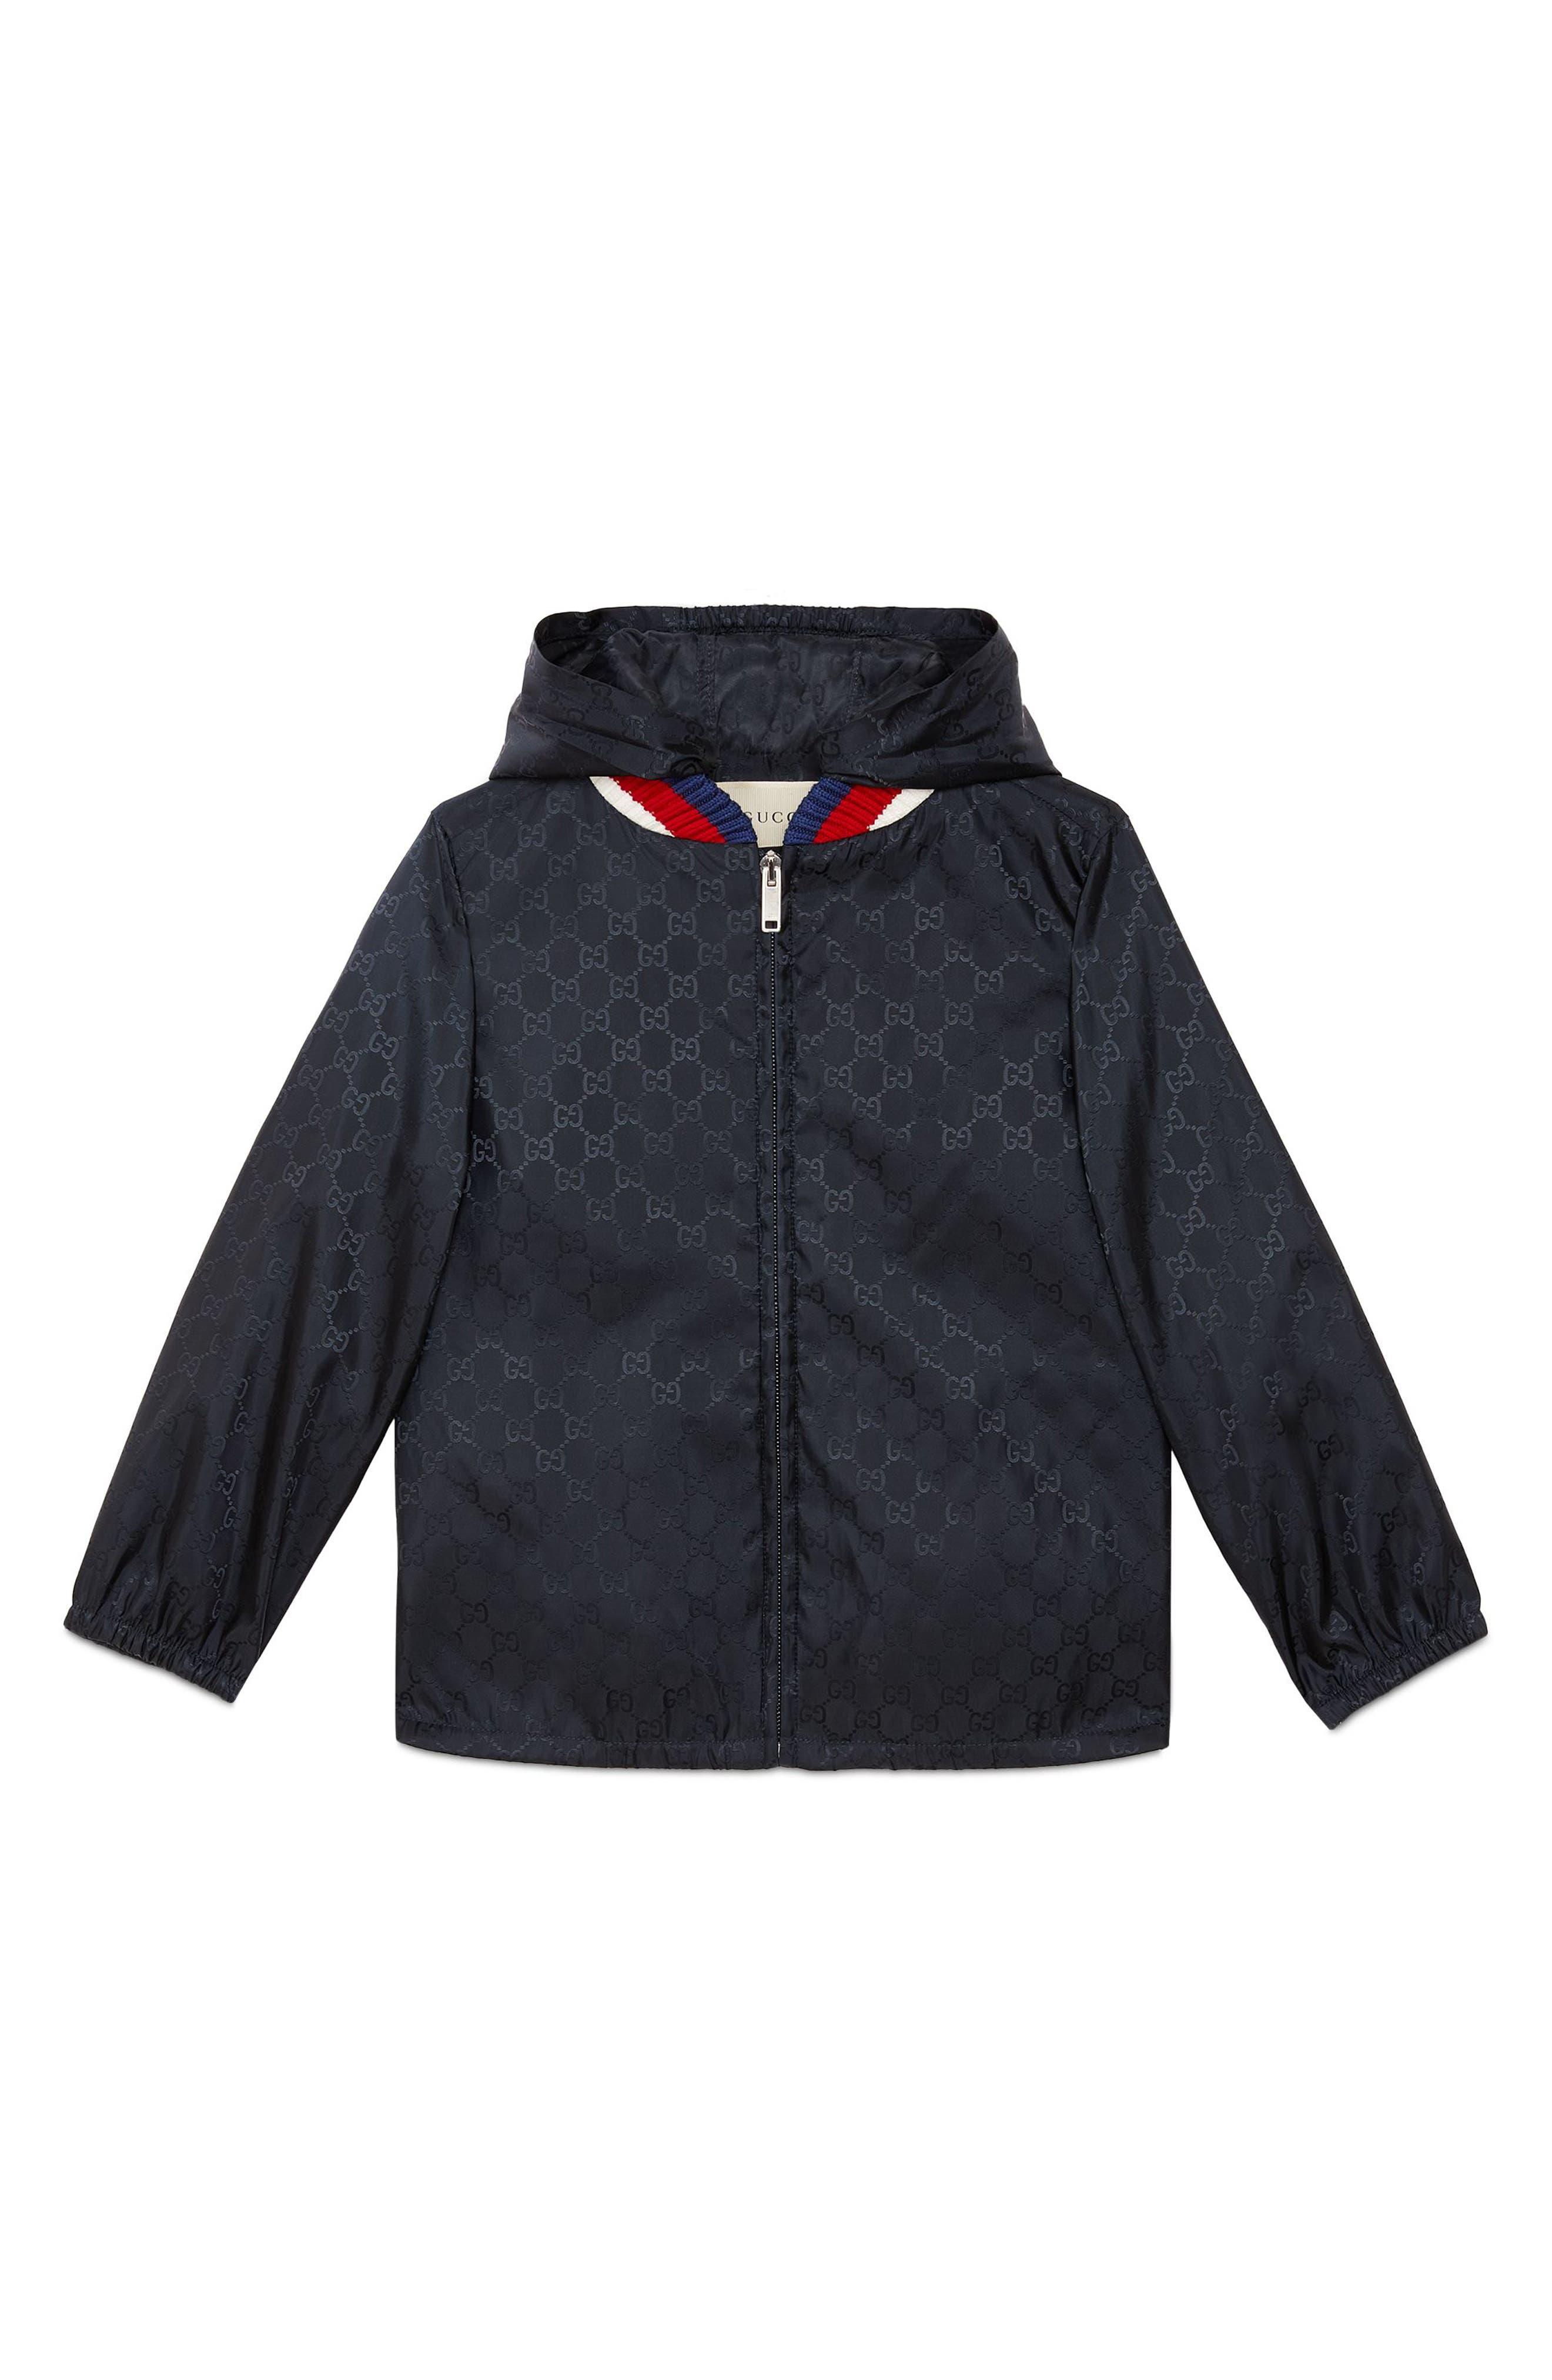 Alternate Image 1 Selected - Gucci Logo Hooded Nylon Jacket (Little Boys & Big Boys)